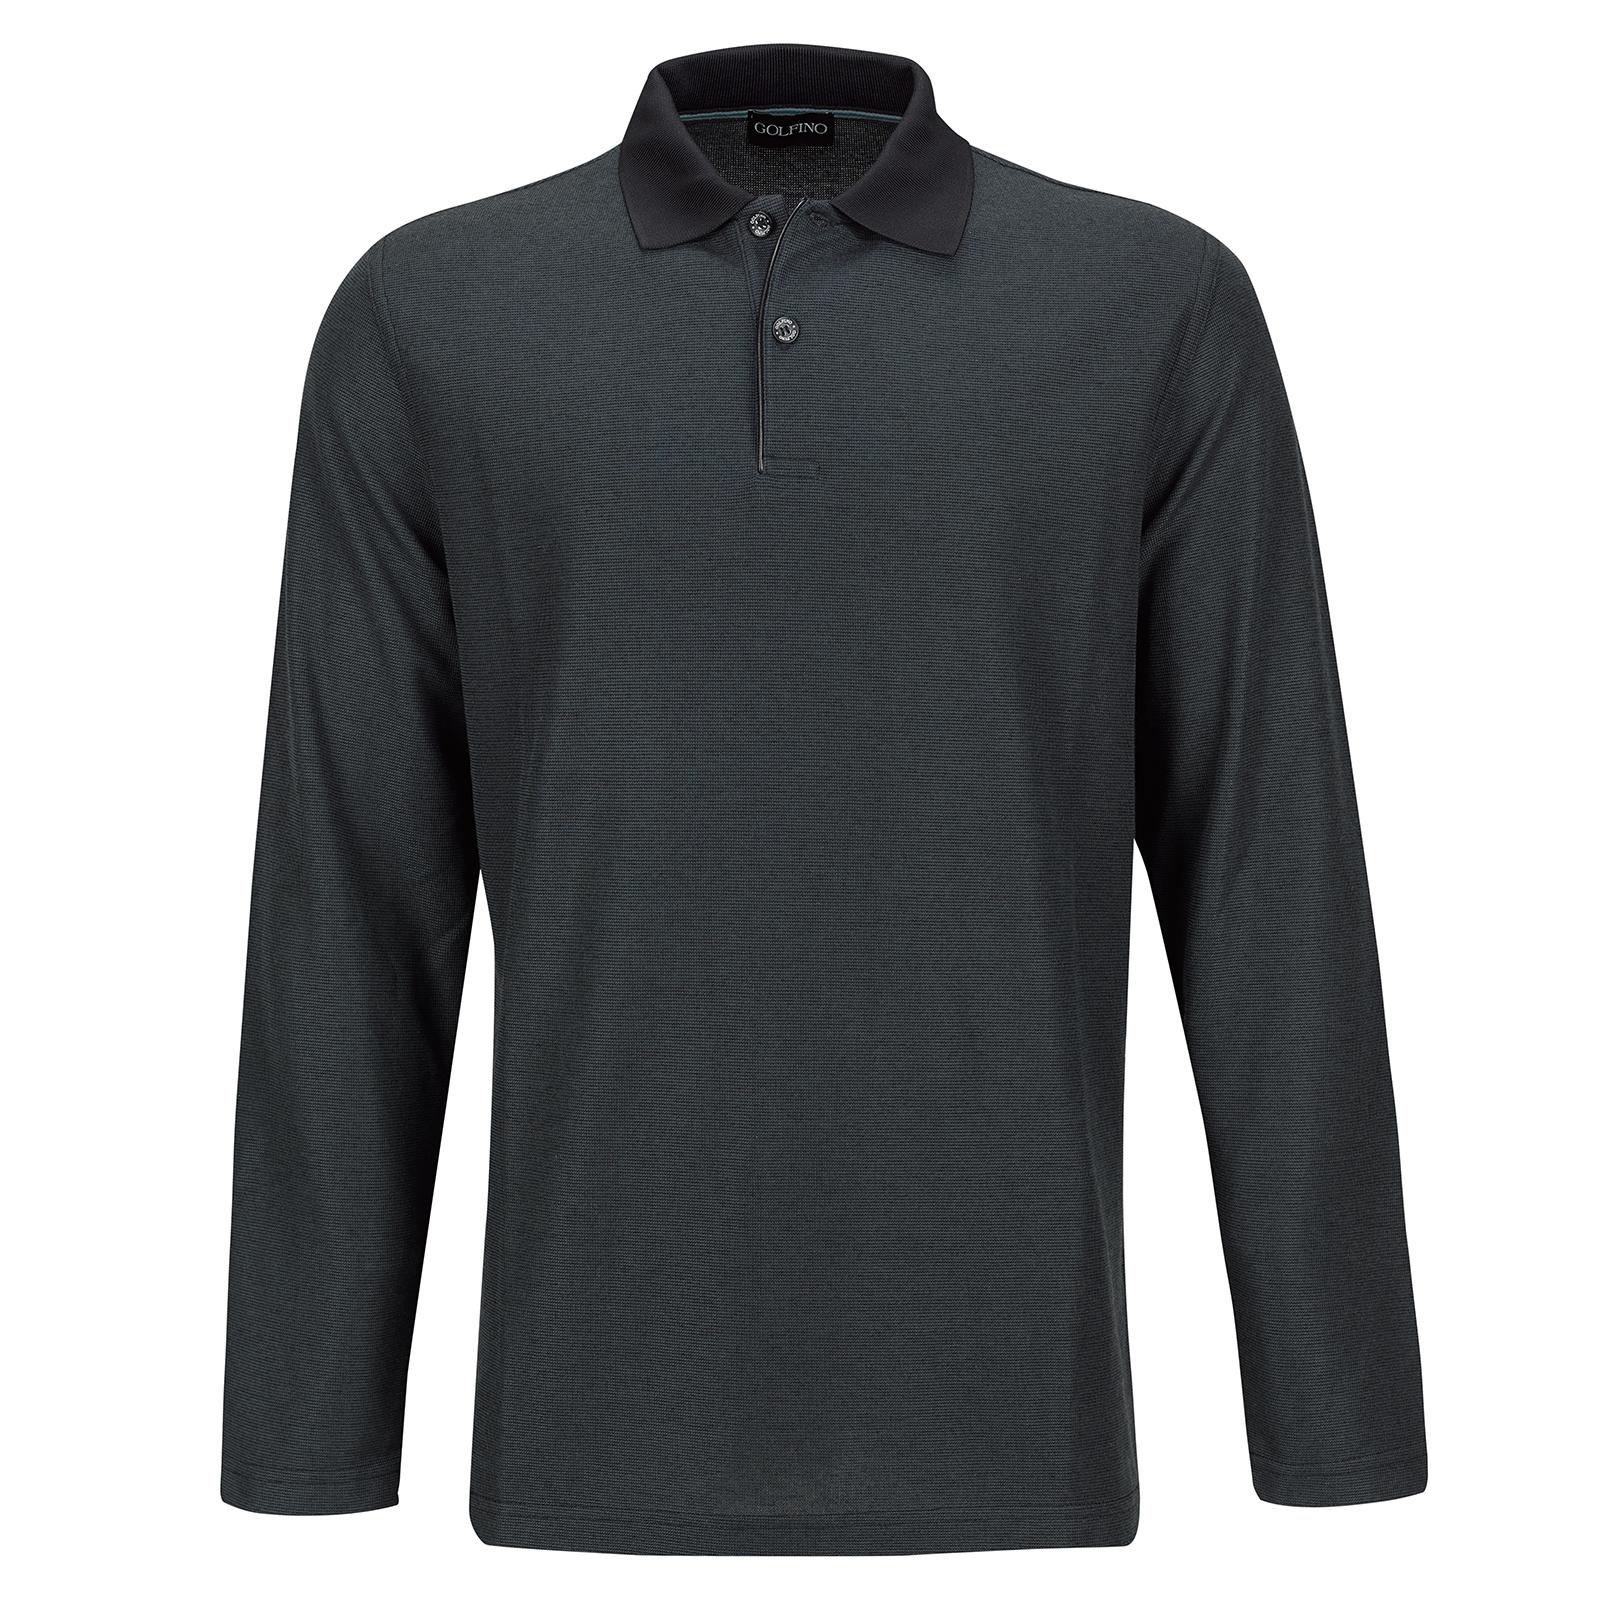 Silver Protection Herren Langarm Golfpolo mit Moisture Management in Regular Fit